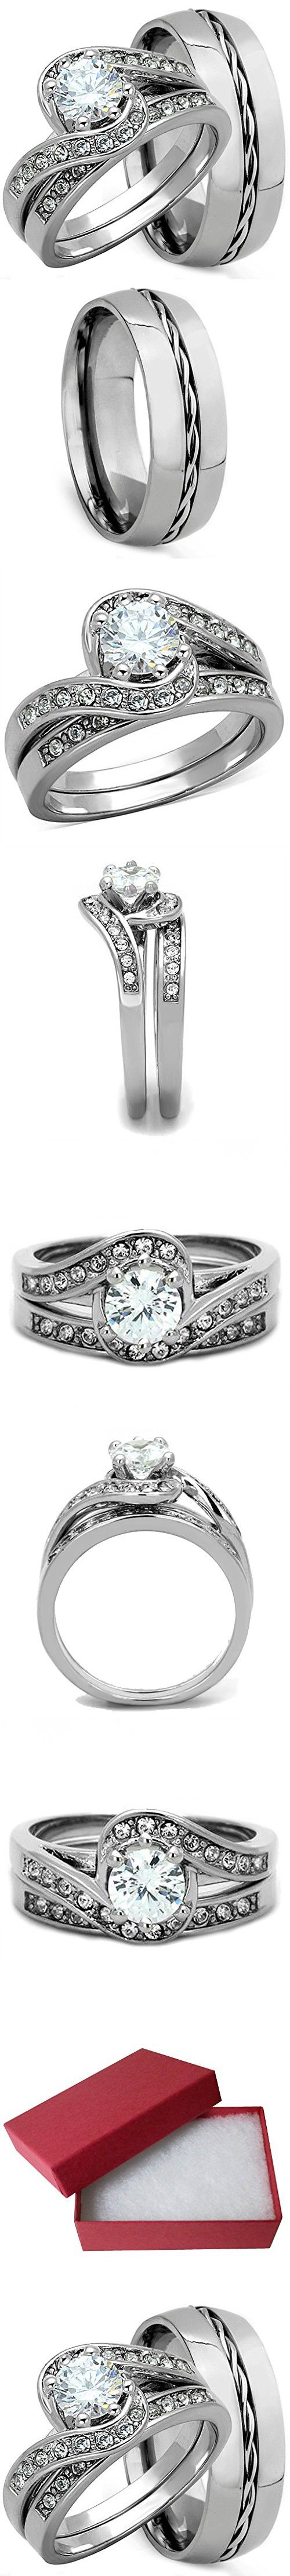 Best 25 Titanium engagement rings ideas on Pinterest